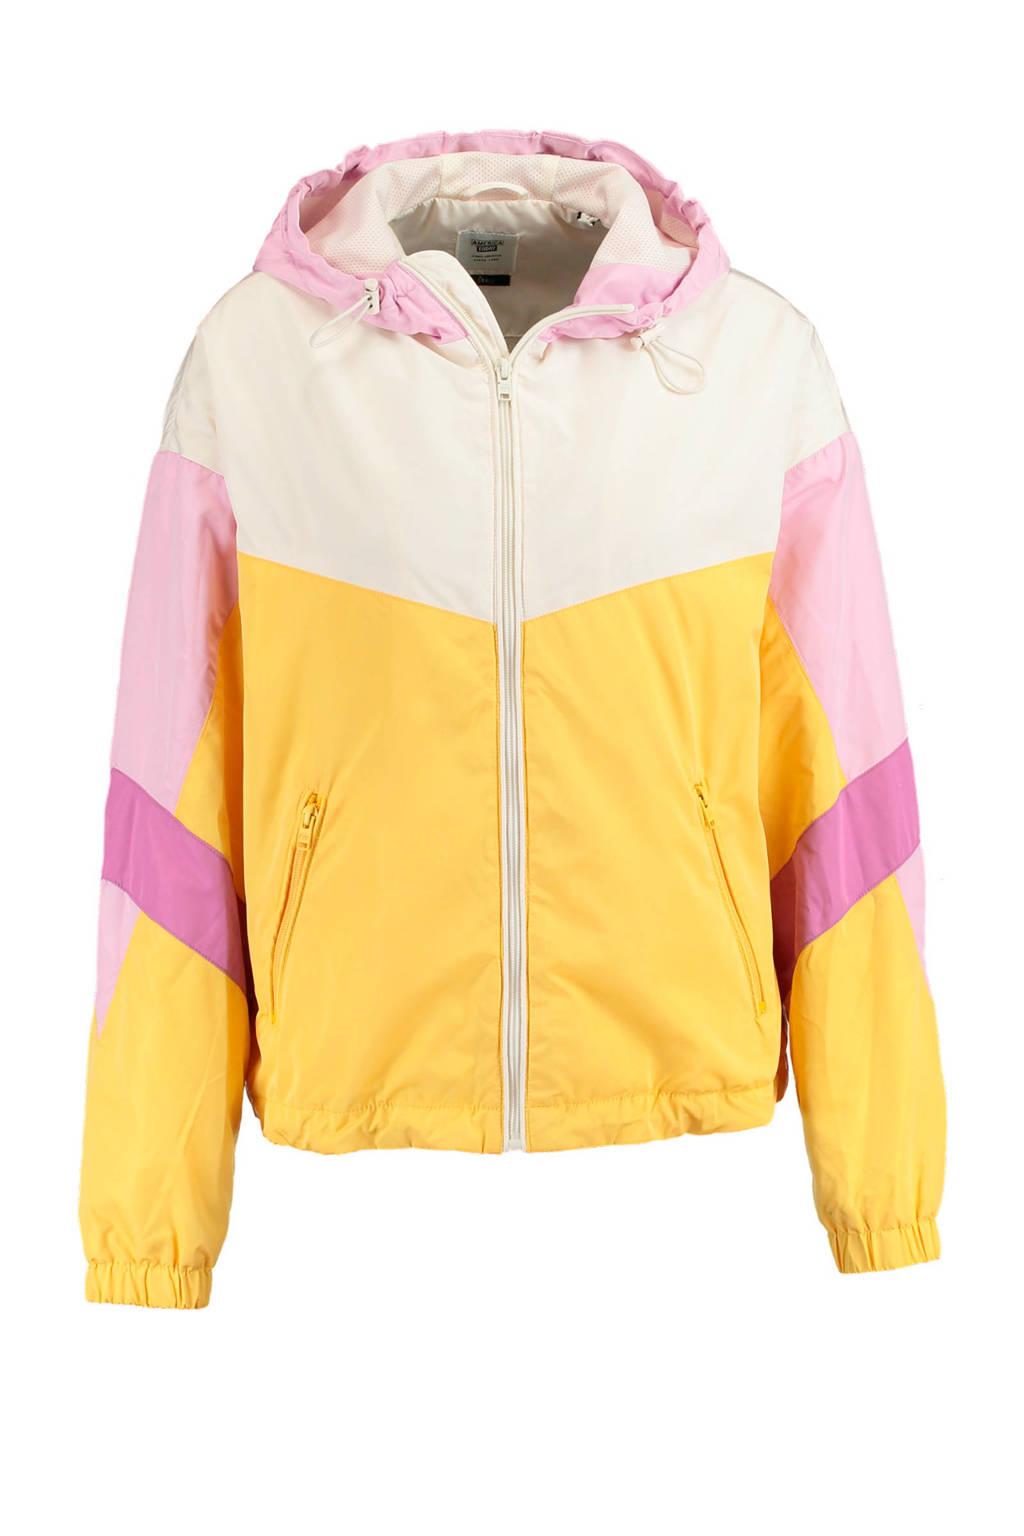 America Today zomerjas geel/ecru/roze, Geel/ecru/roze